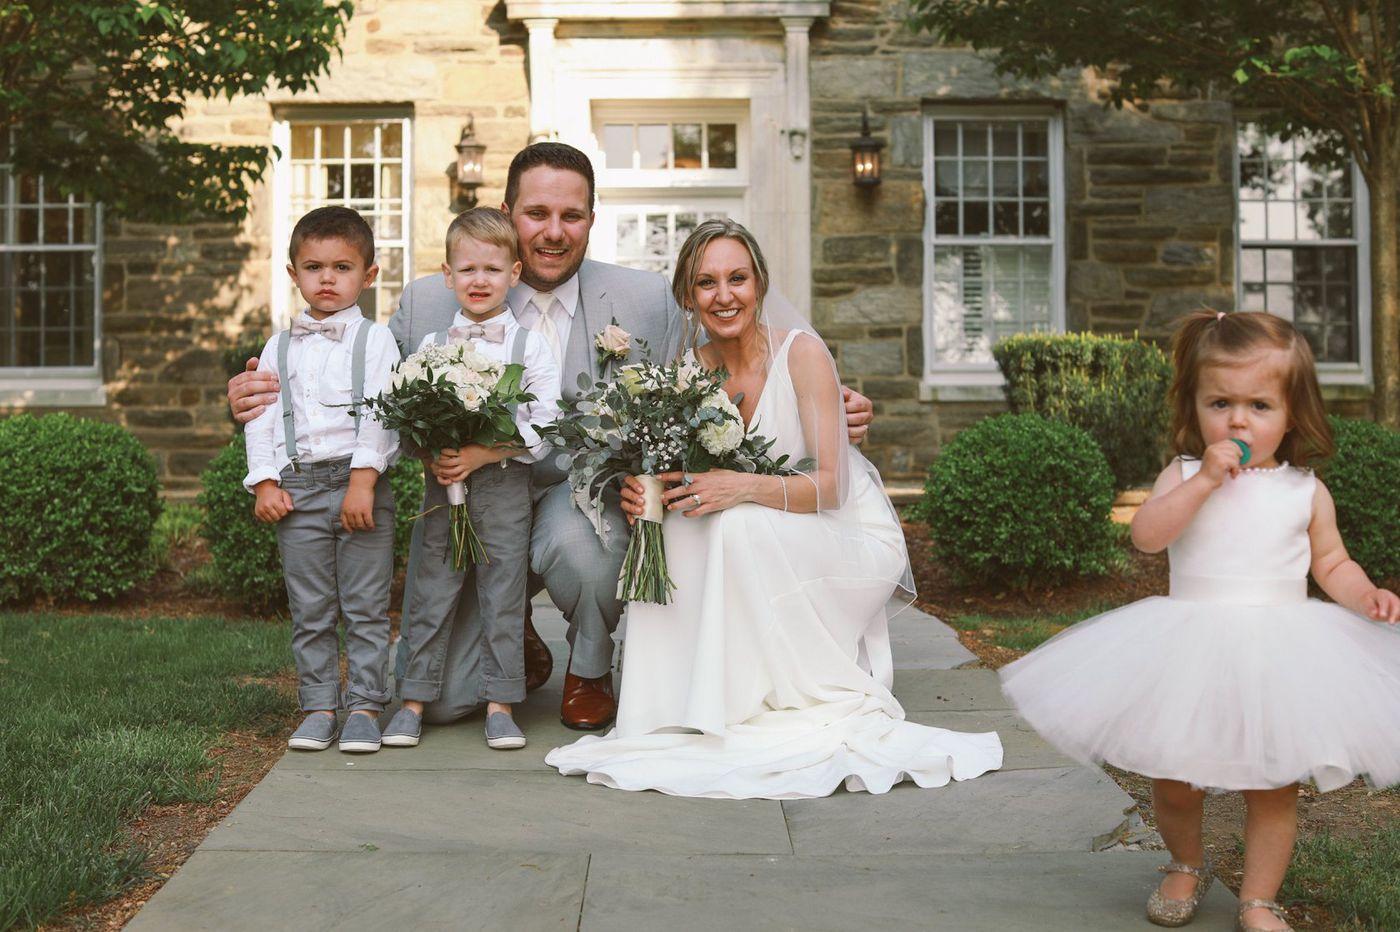 Philadelphia Weddings: Alex Miller and Nick Anshant